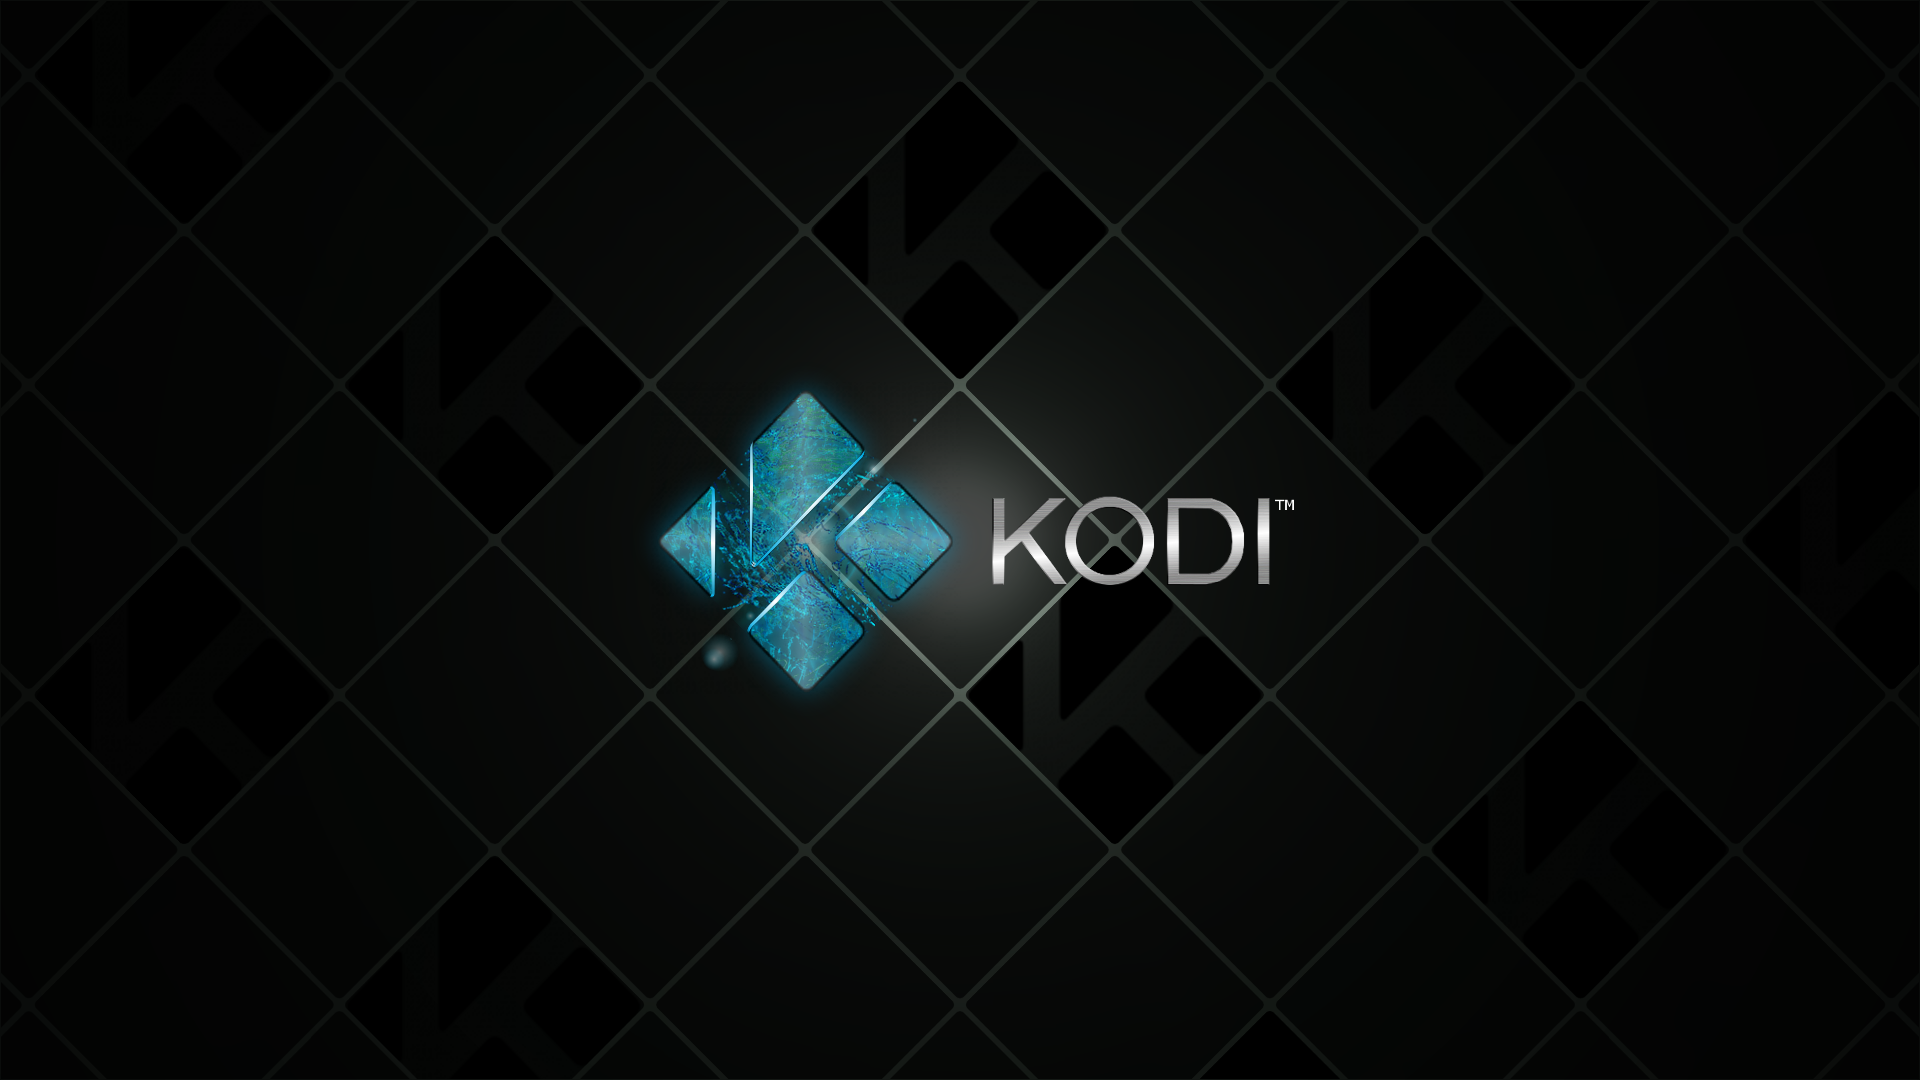 how to download older version of kodi